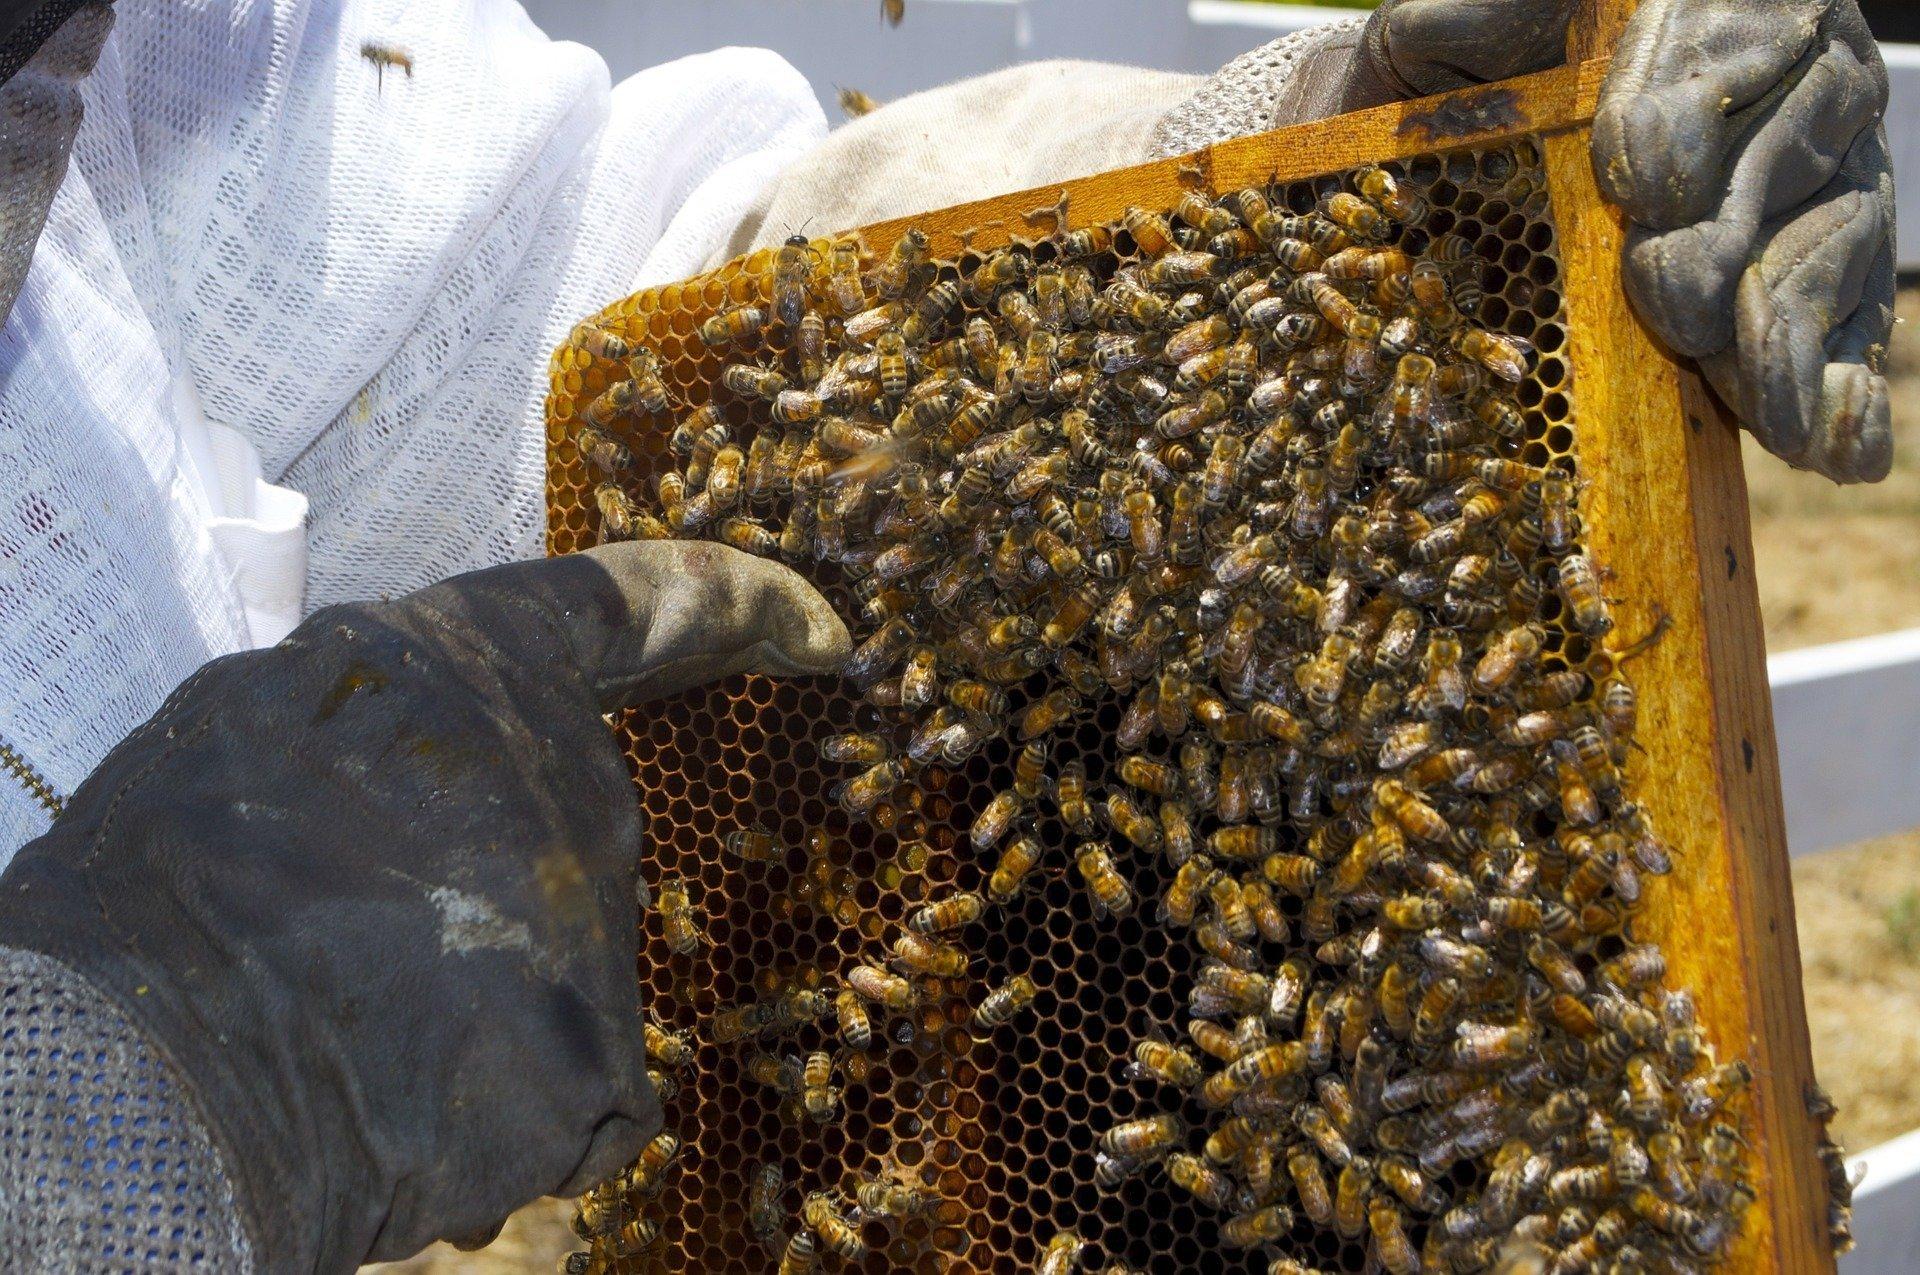 EU to discuss Hungarian initiative on honey, beekeepers